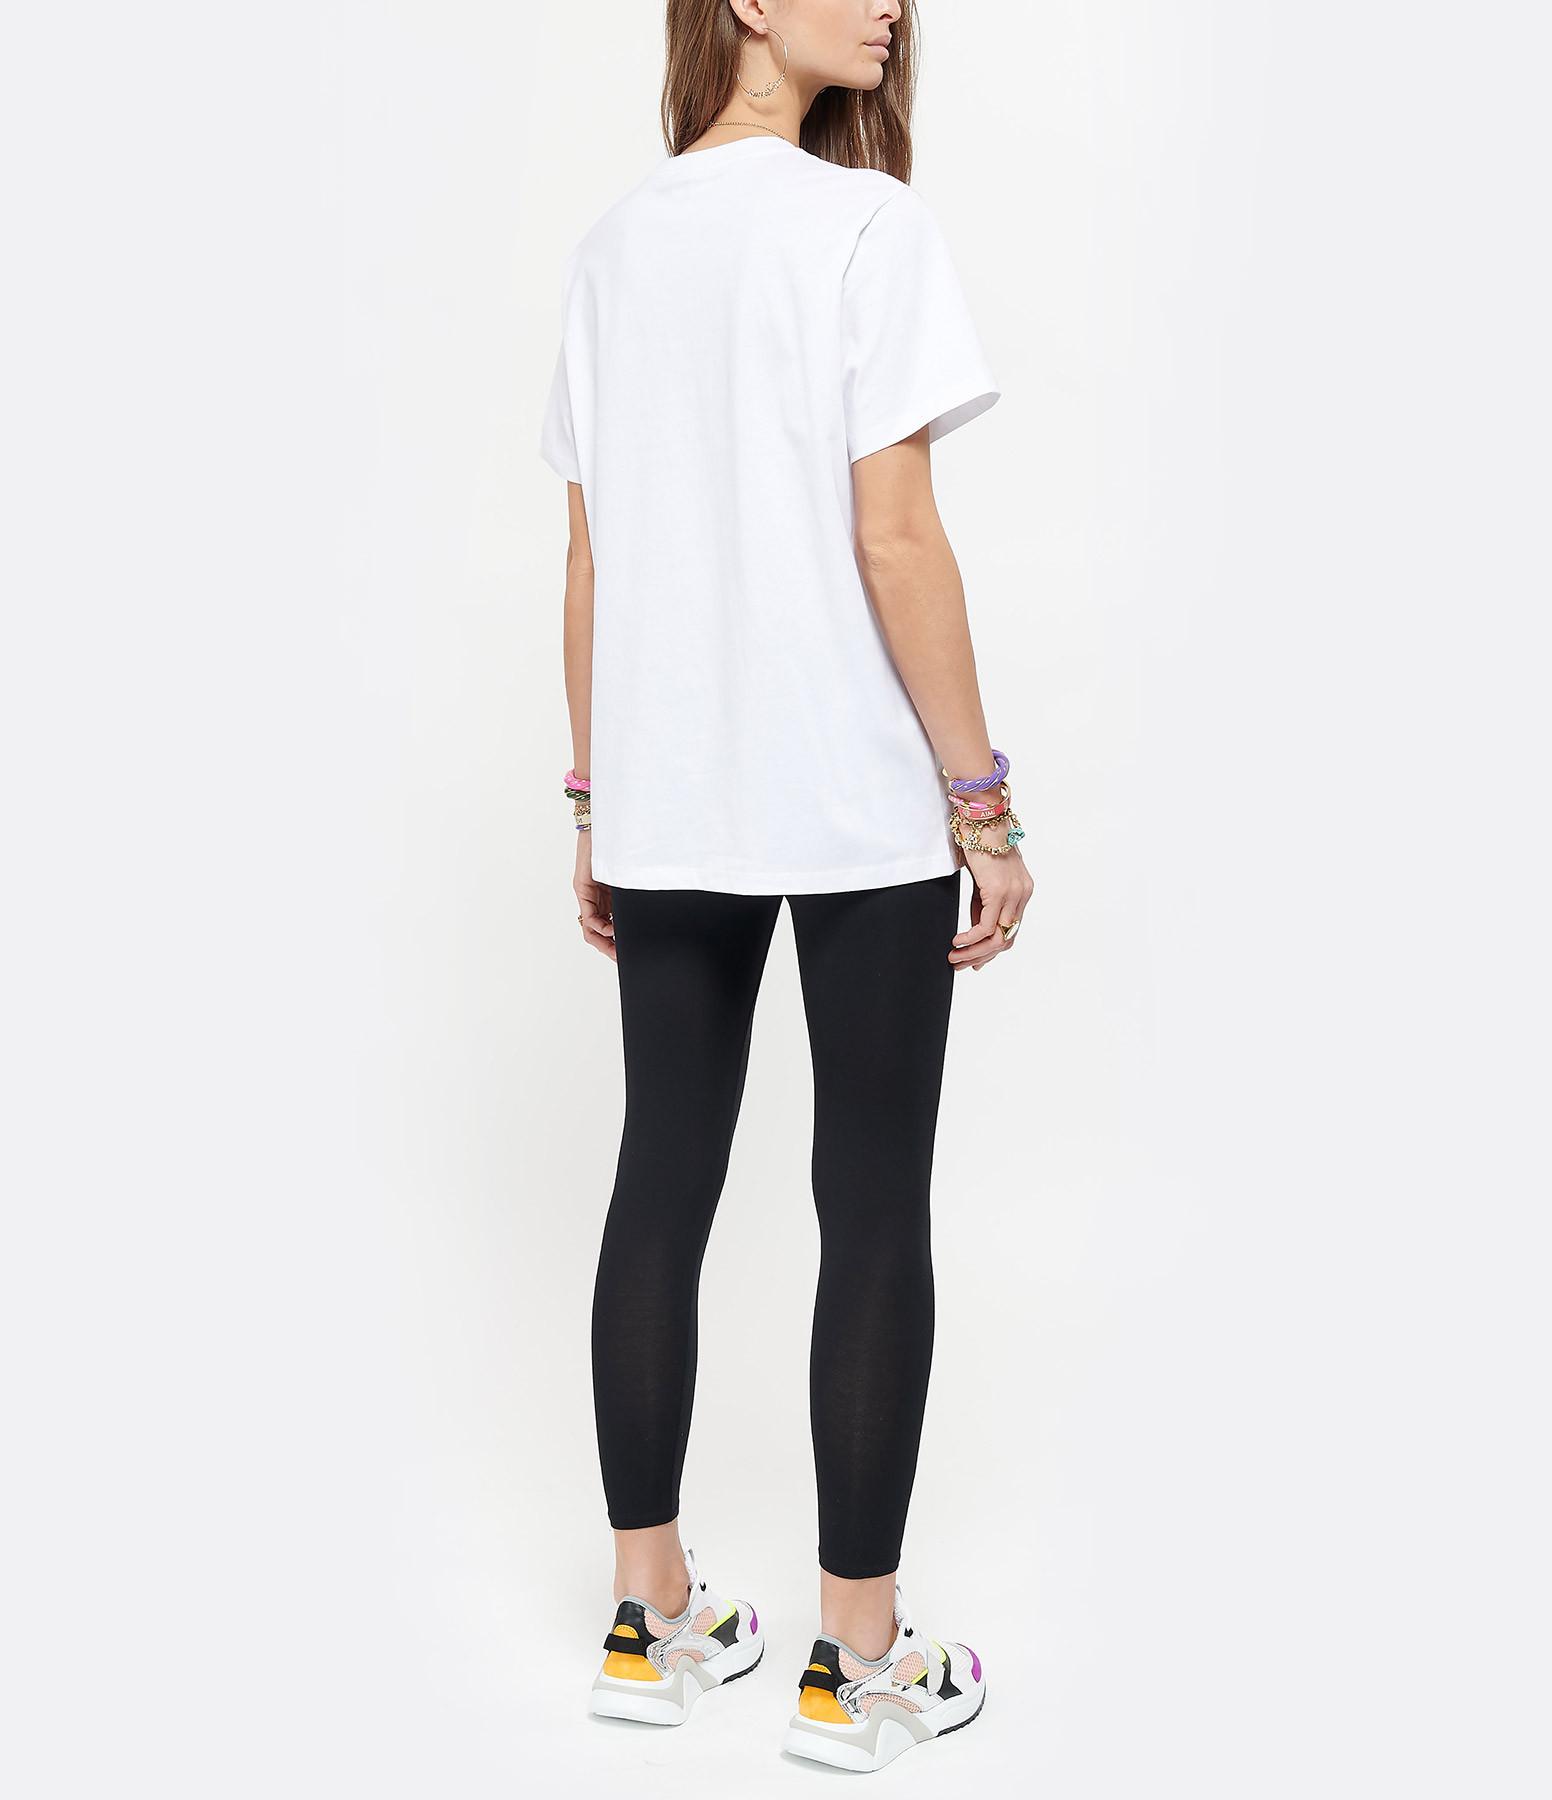 GANNI - Tee-shirt Basic Ganni Coton Blanc